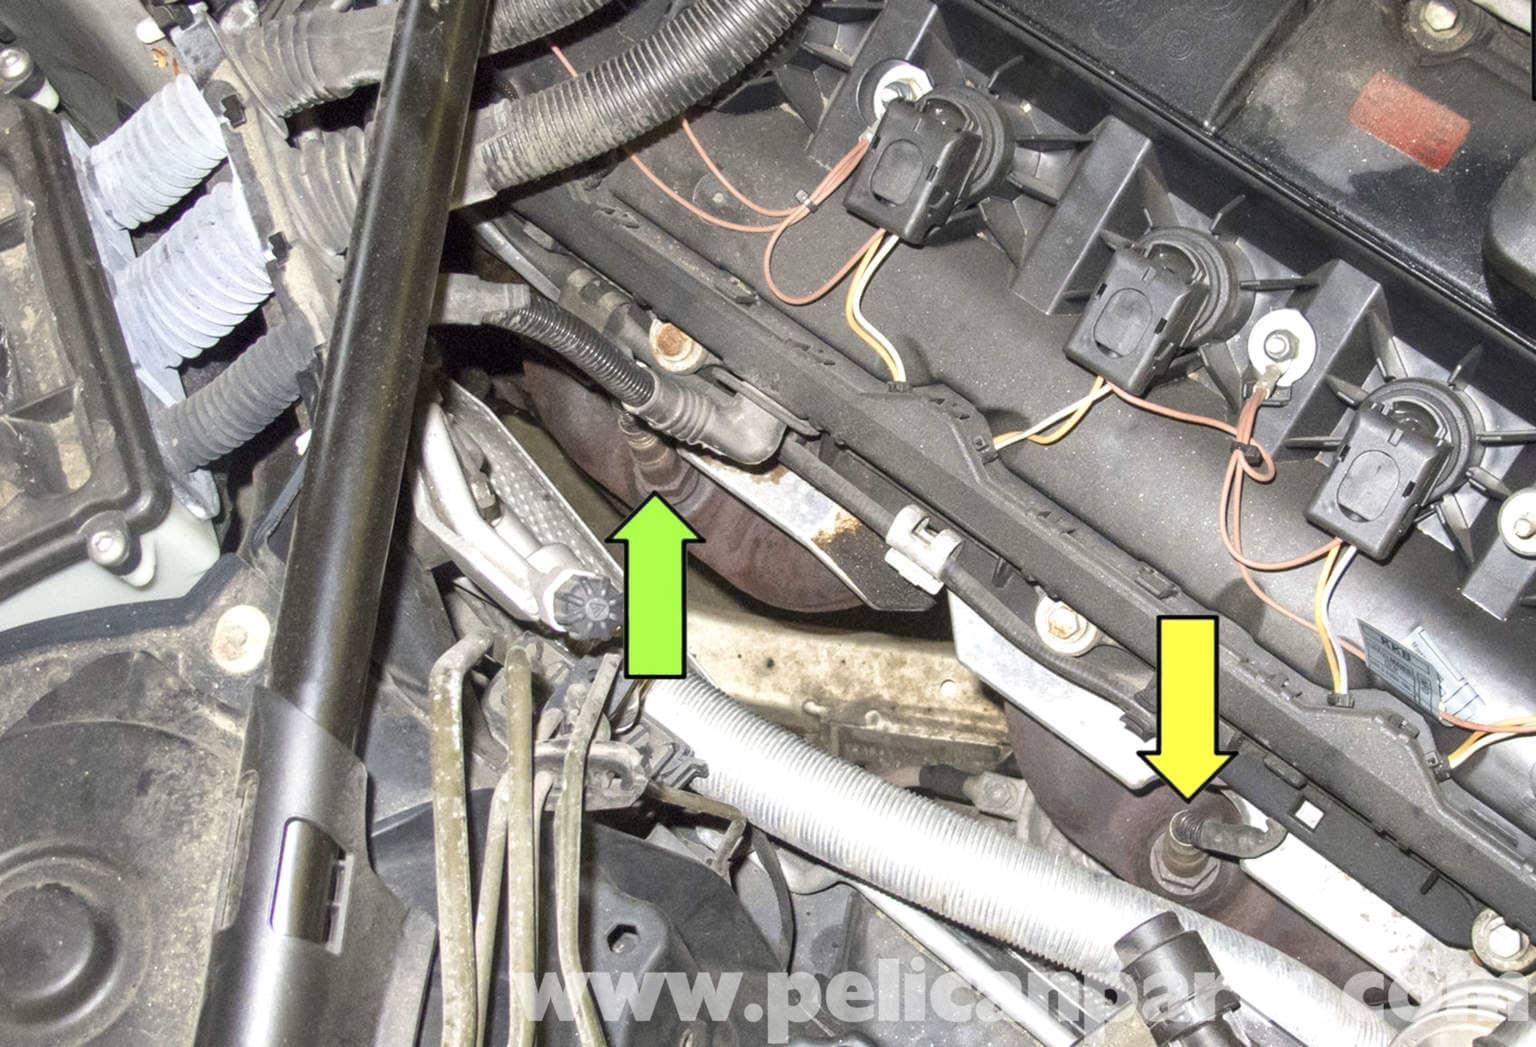 Xi Fuse Diagram Bmw E60 5 Series Engine Management Systems 2003 2010